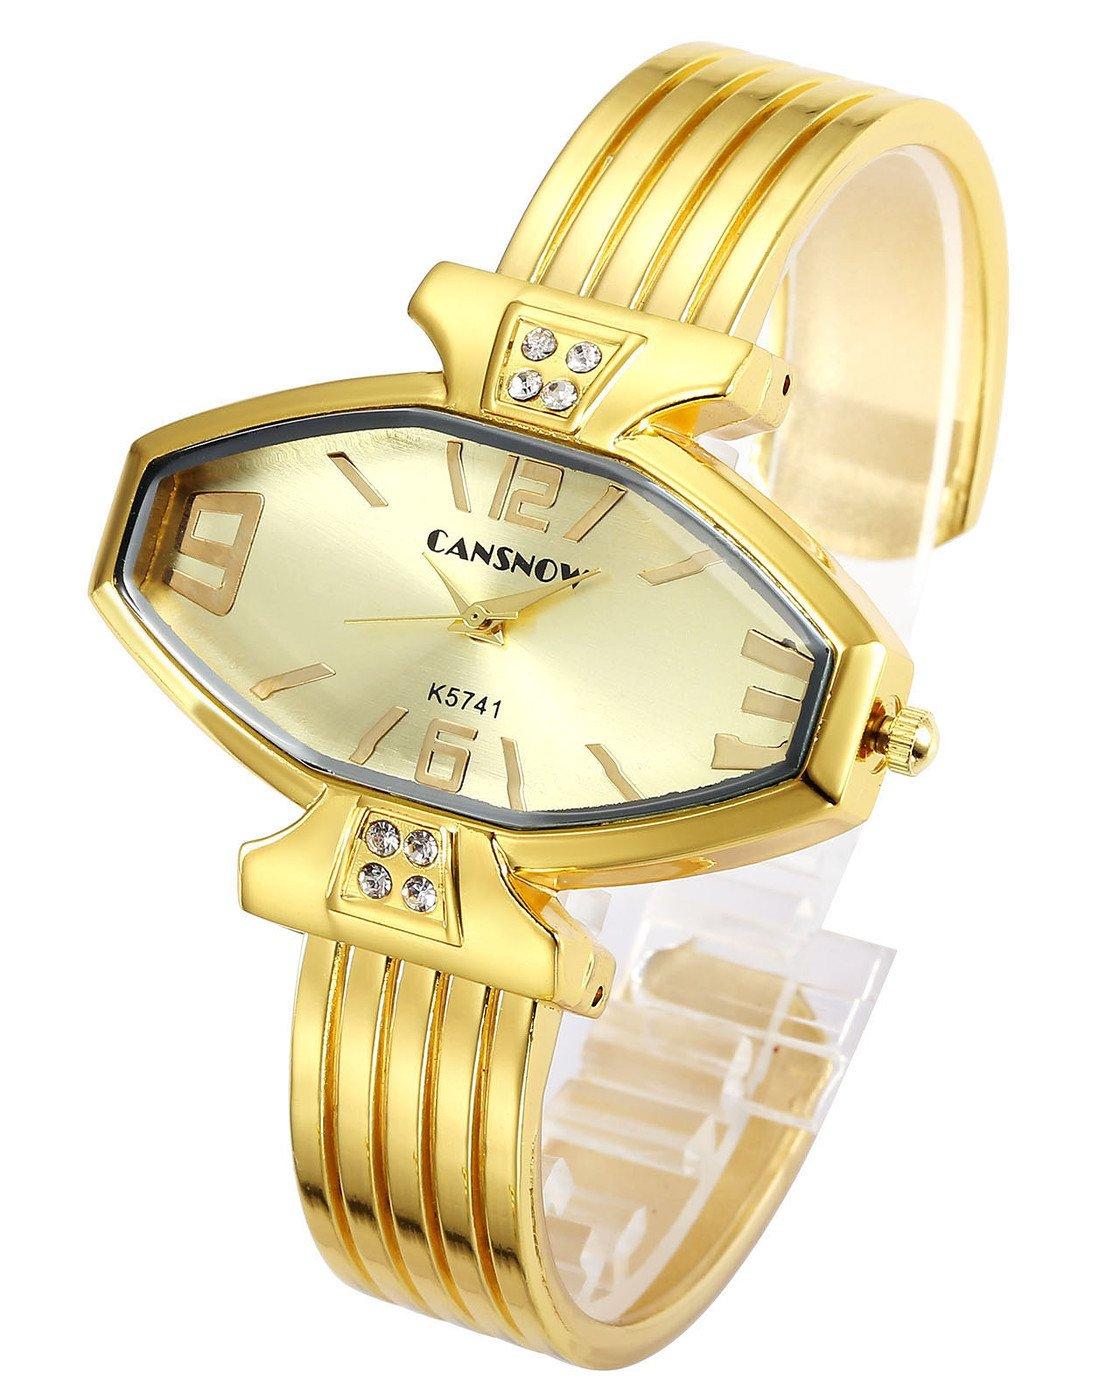 Top Plaza Women Ladies Casual Luxury Gold Rose Gold Tone Alloy Analog Quartz Bracelet Watch Rhombus Dial Rhinestones Decorated Elegant Dress Bangle Cuff Wristwatch-All Gold